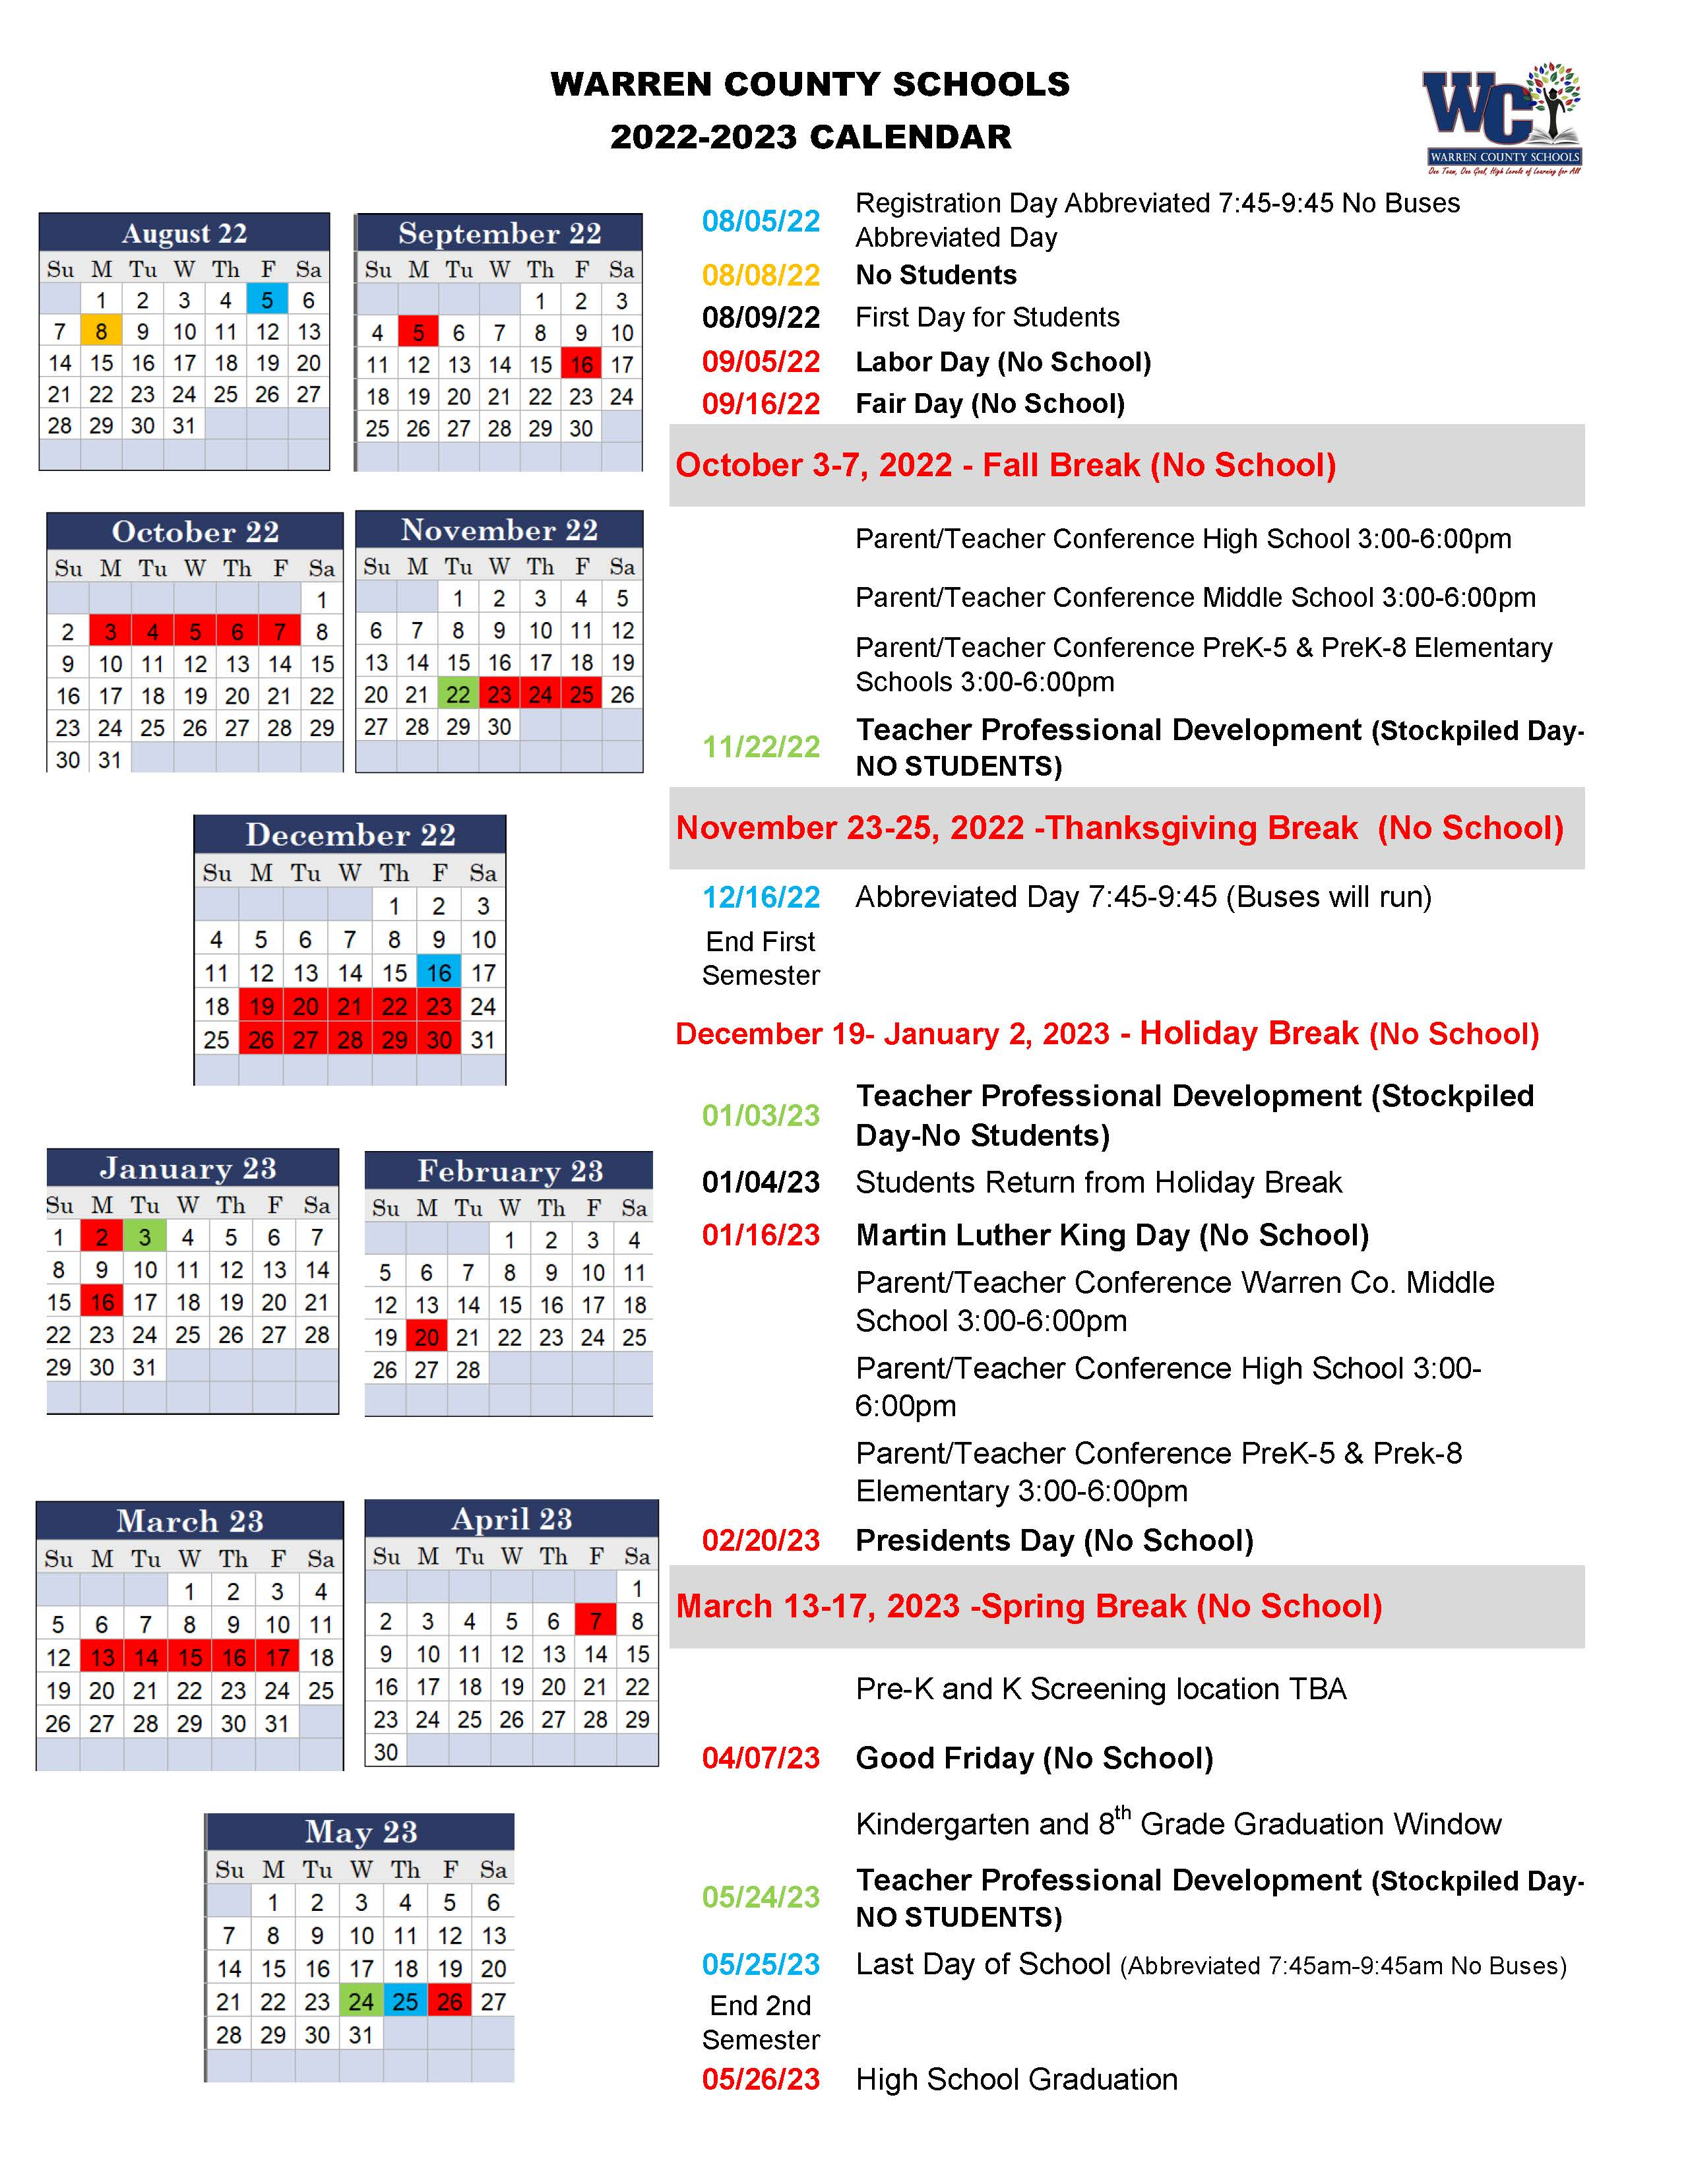 Wcs Calendar 2022.All News Warren County Schools